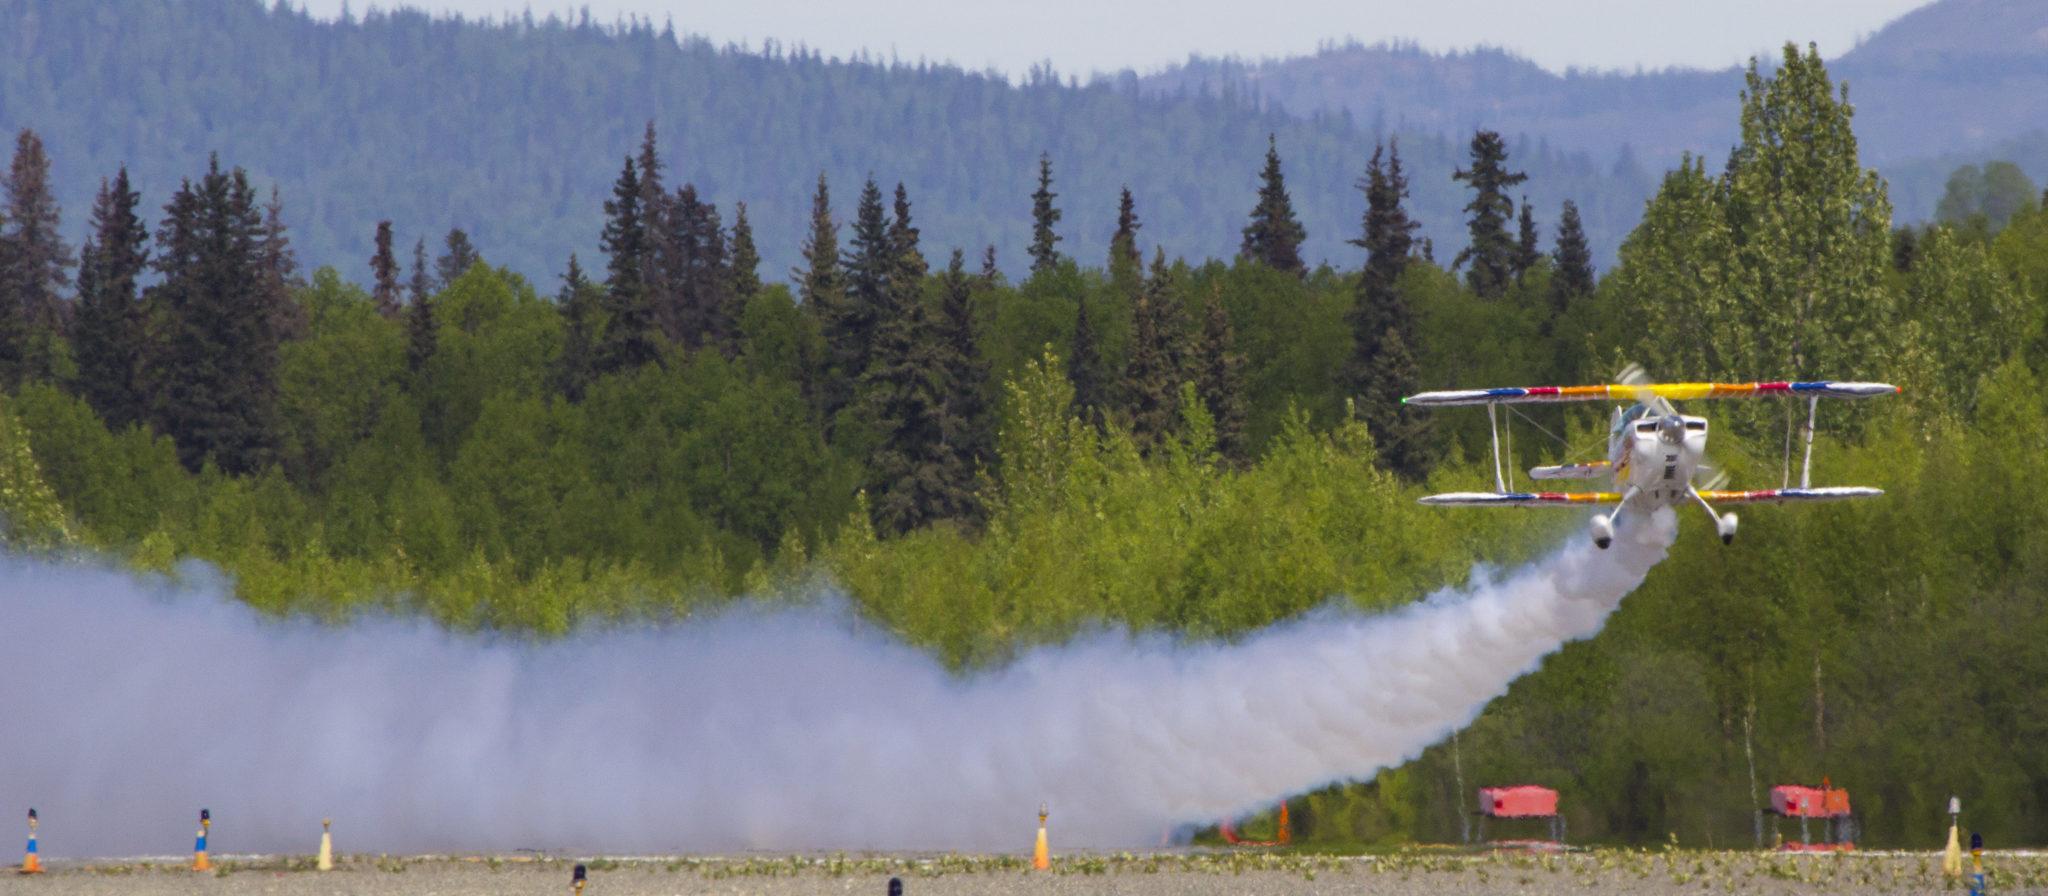 Aircraft Photography Alaska | Alaskafoto - Best Aircraft portraits & Airplane photographer